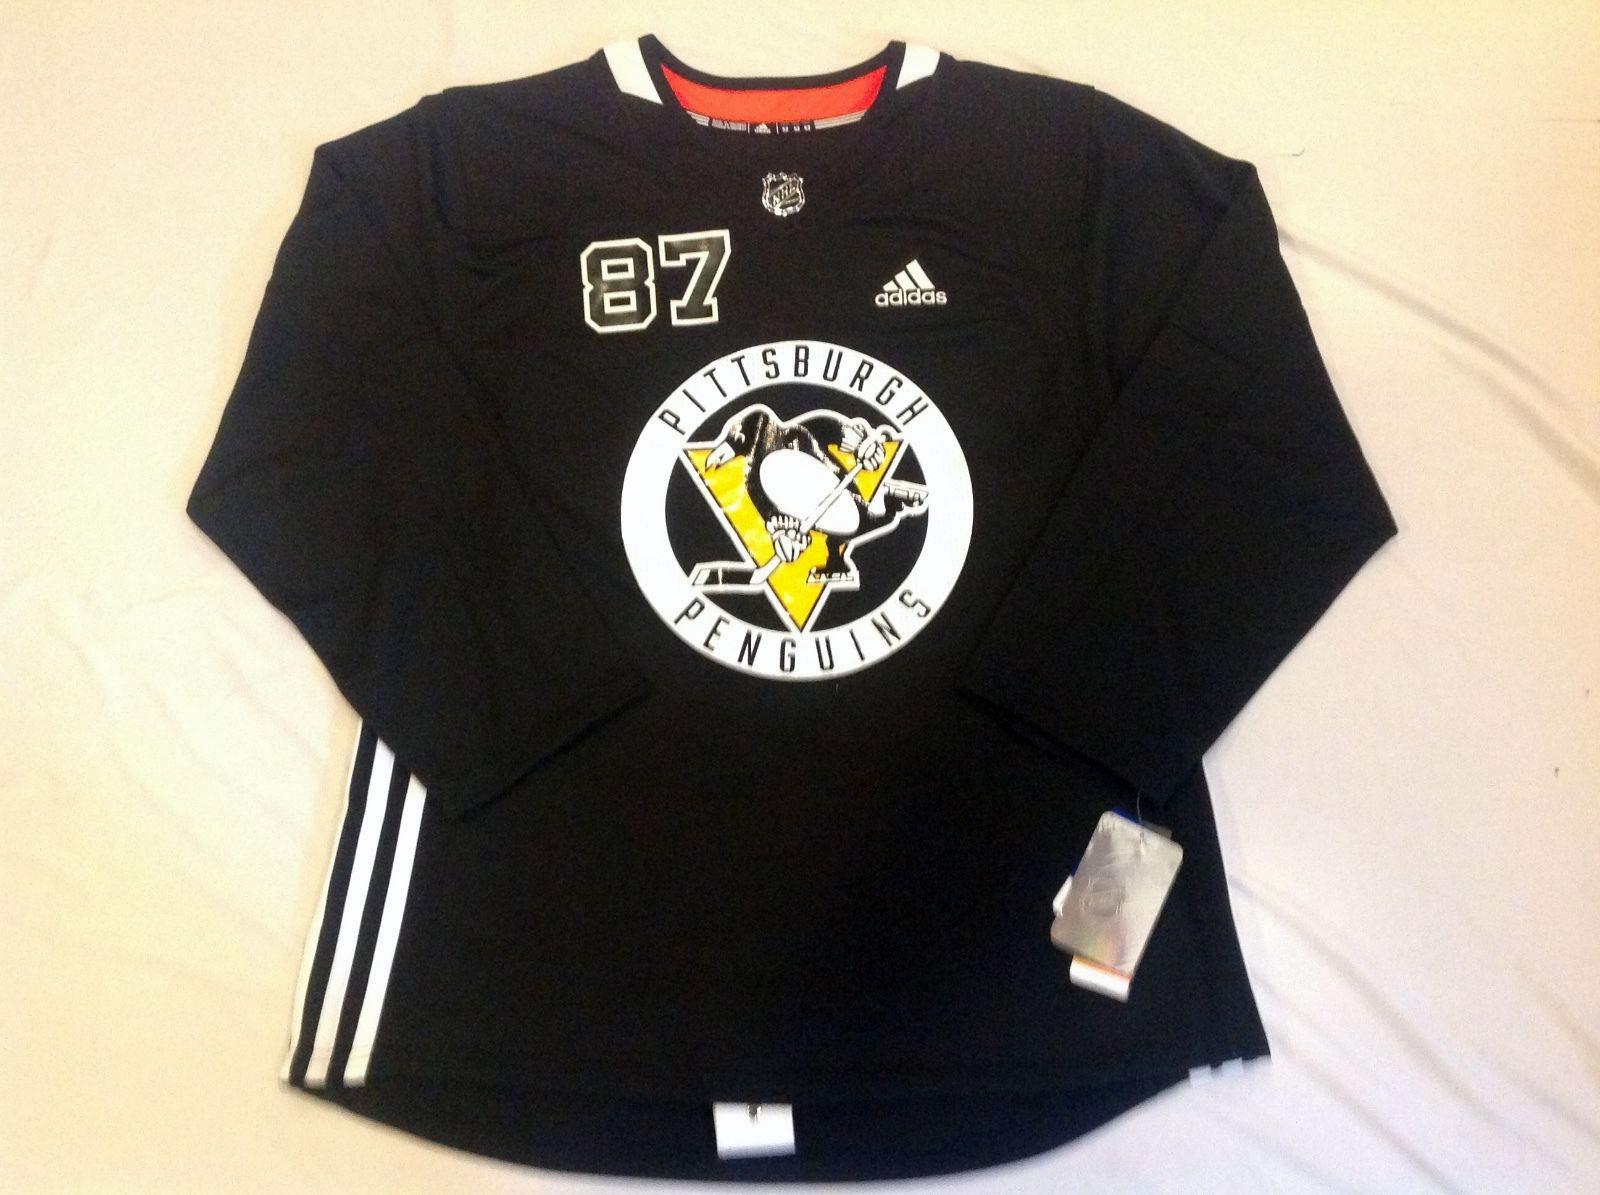 Confirmed: Leak of Adidas NHL Jersey Pops Up on eBay